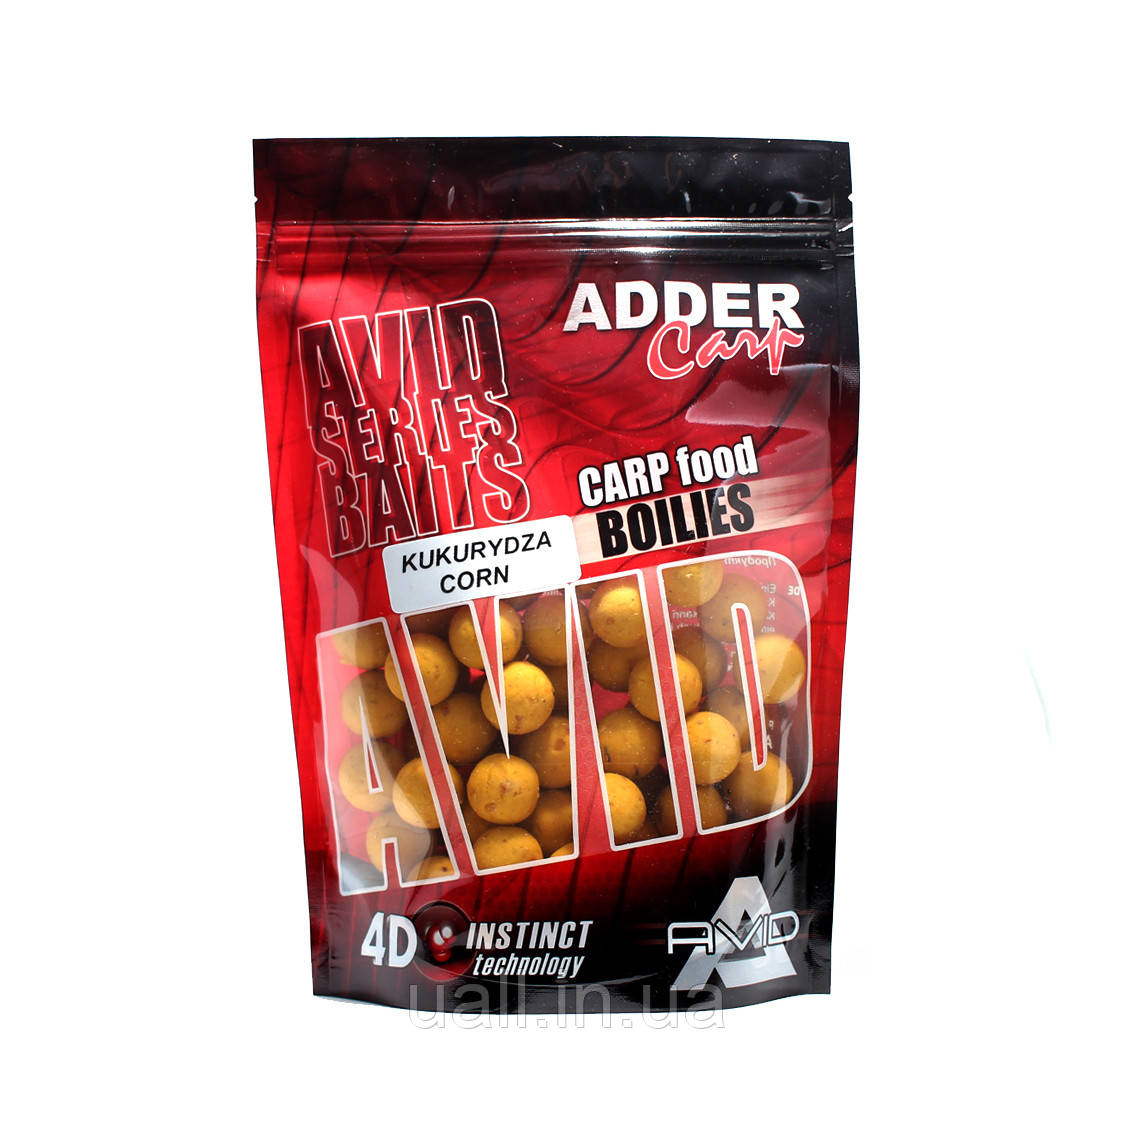 Бойл Adder Carp Boilies AVID Corn 200g (18mm) (Кукурудза)